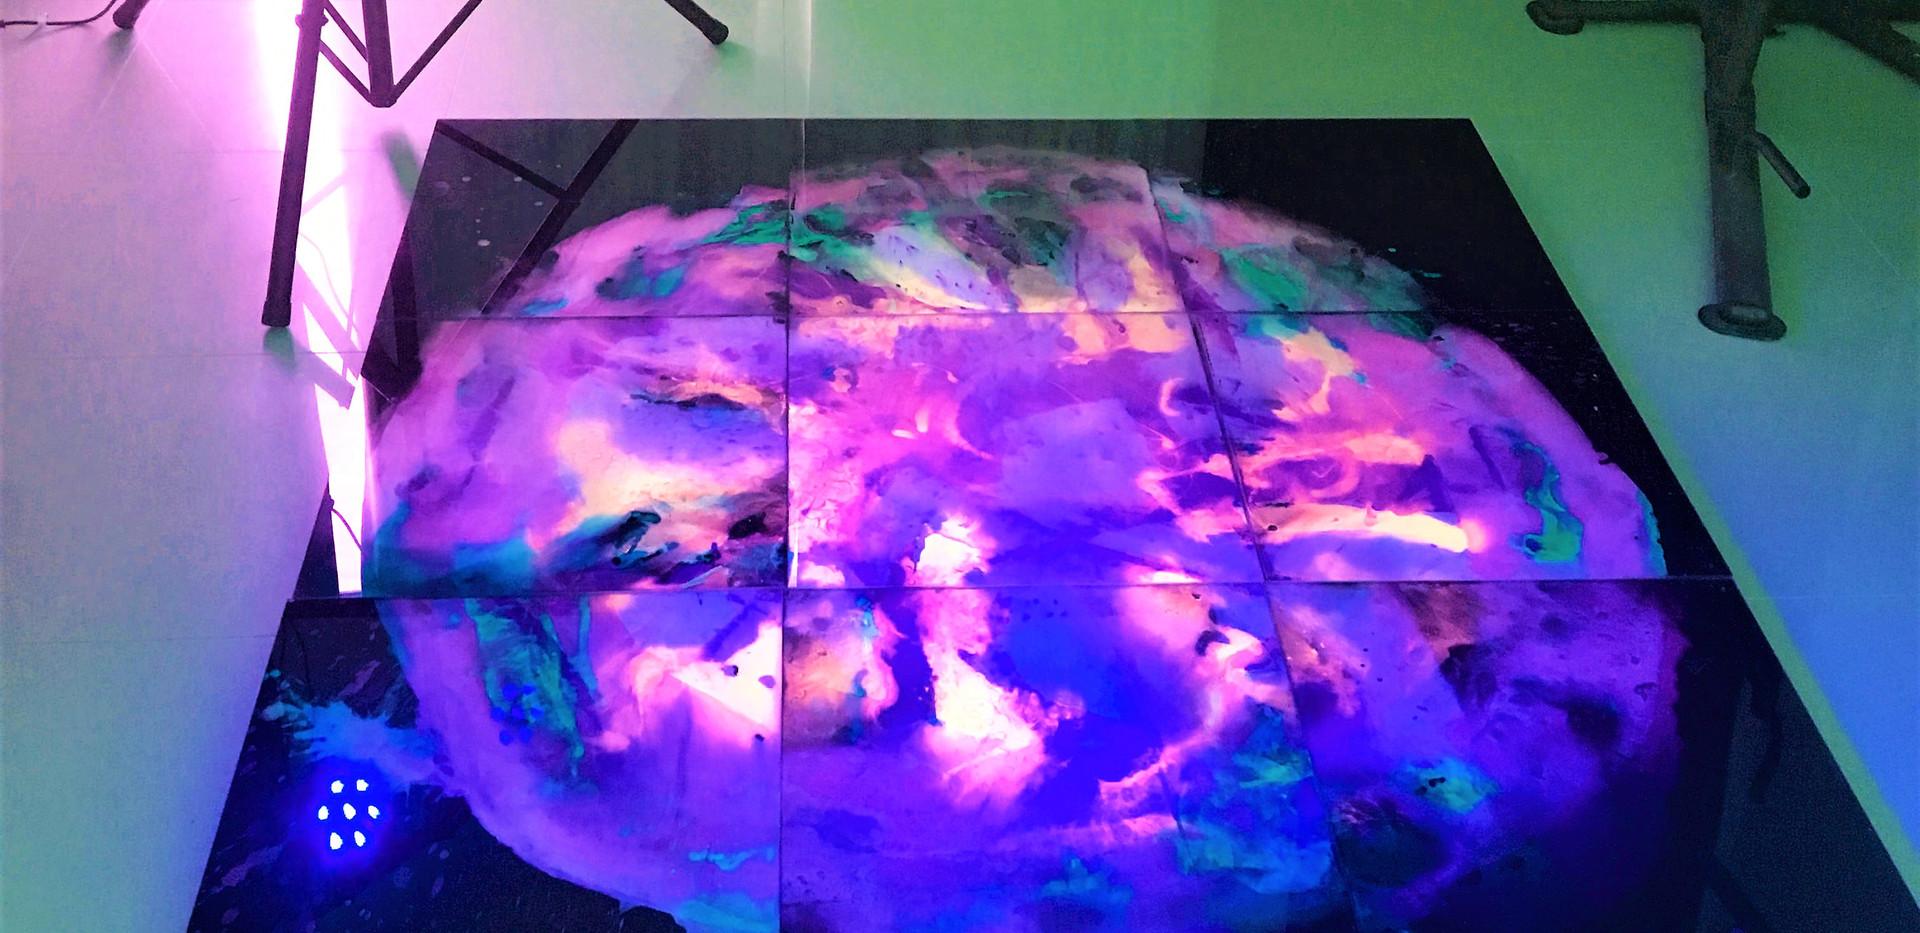 Whirlpool installation at OASIIS